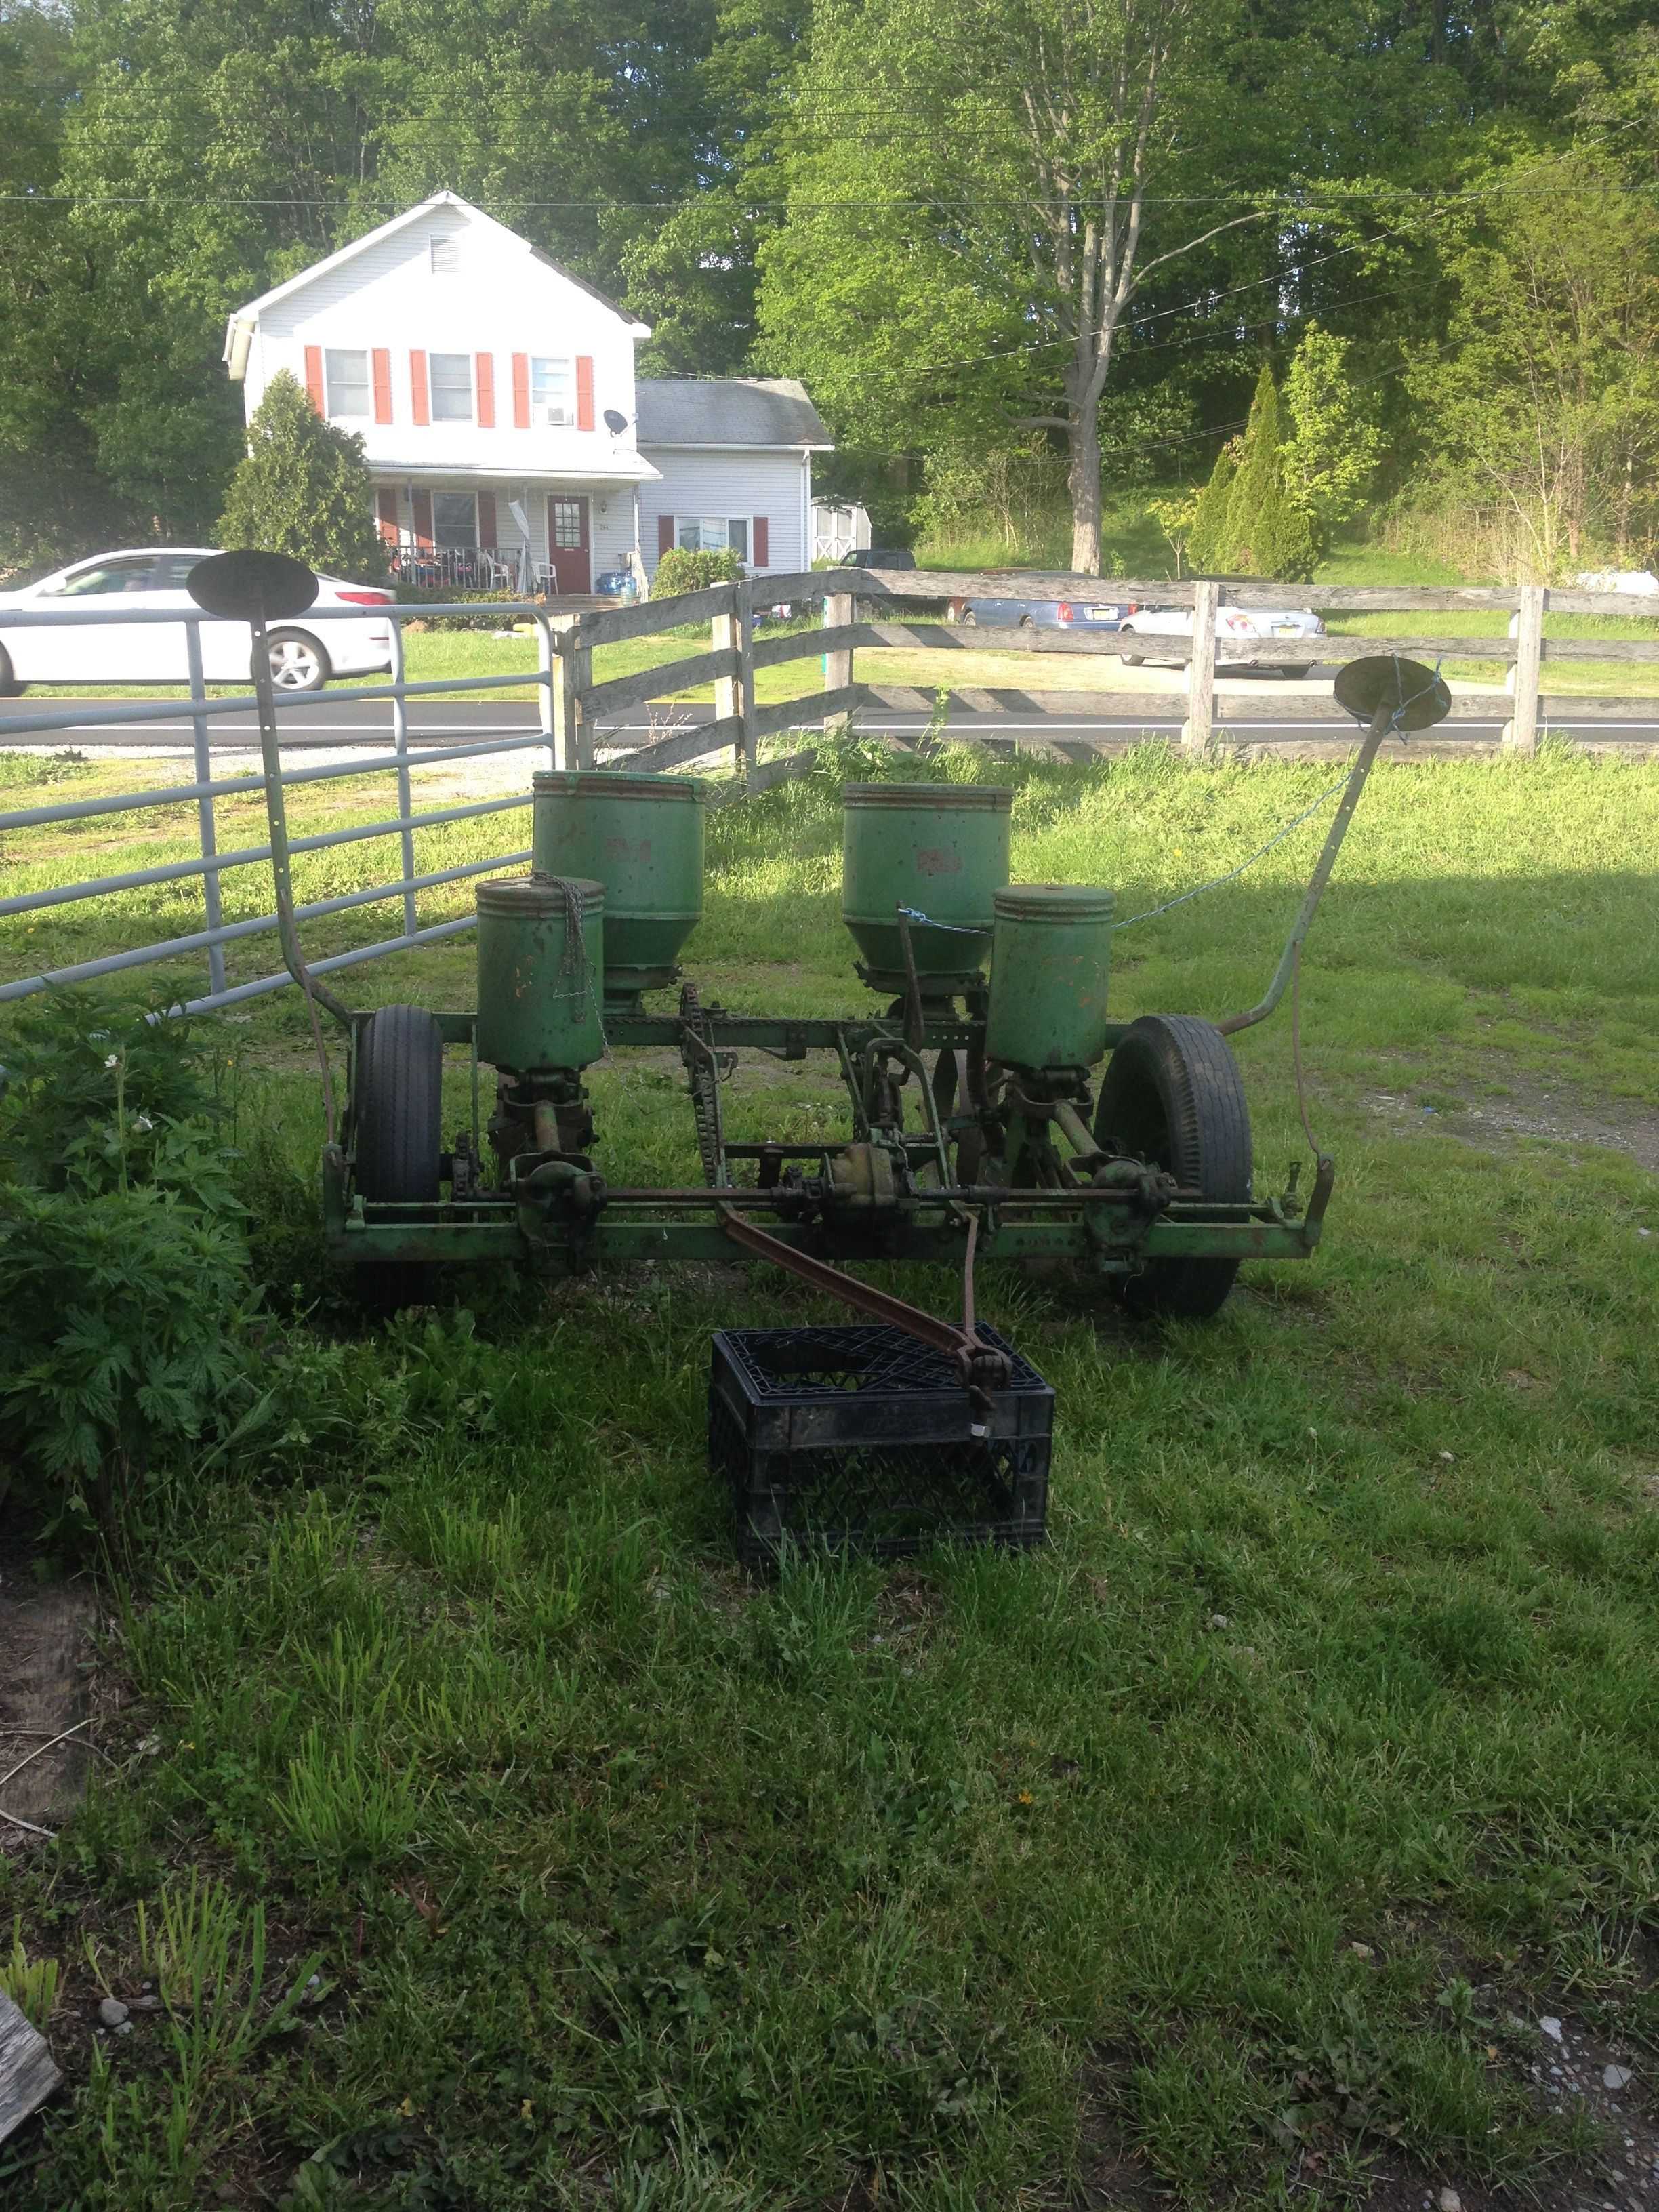 1956 John Deere Model 290 Planter With Fertilizer Option And Row